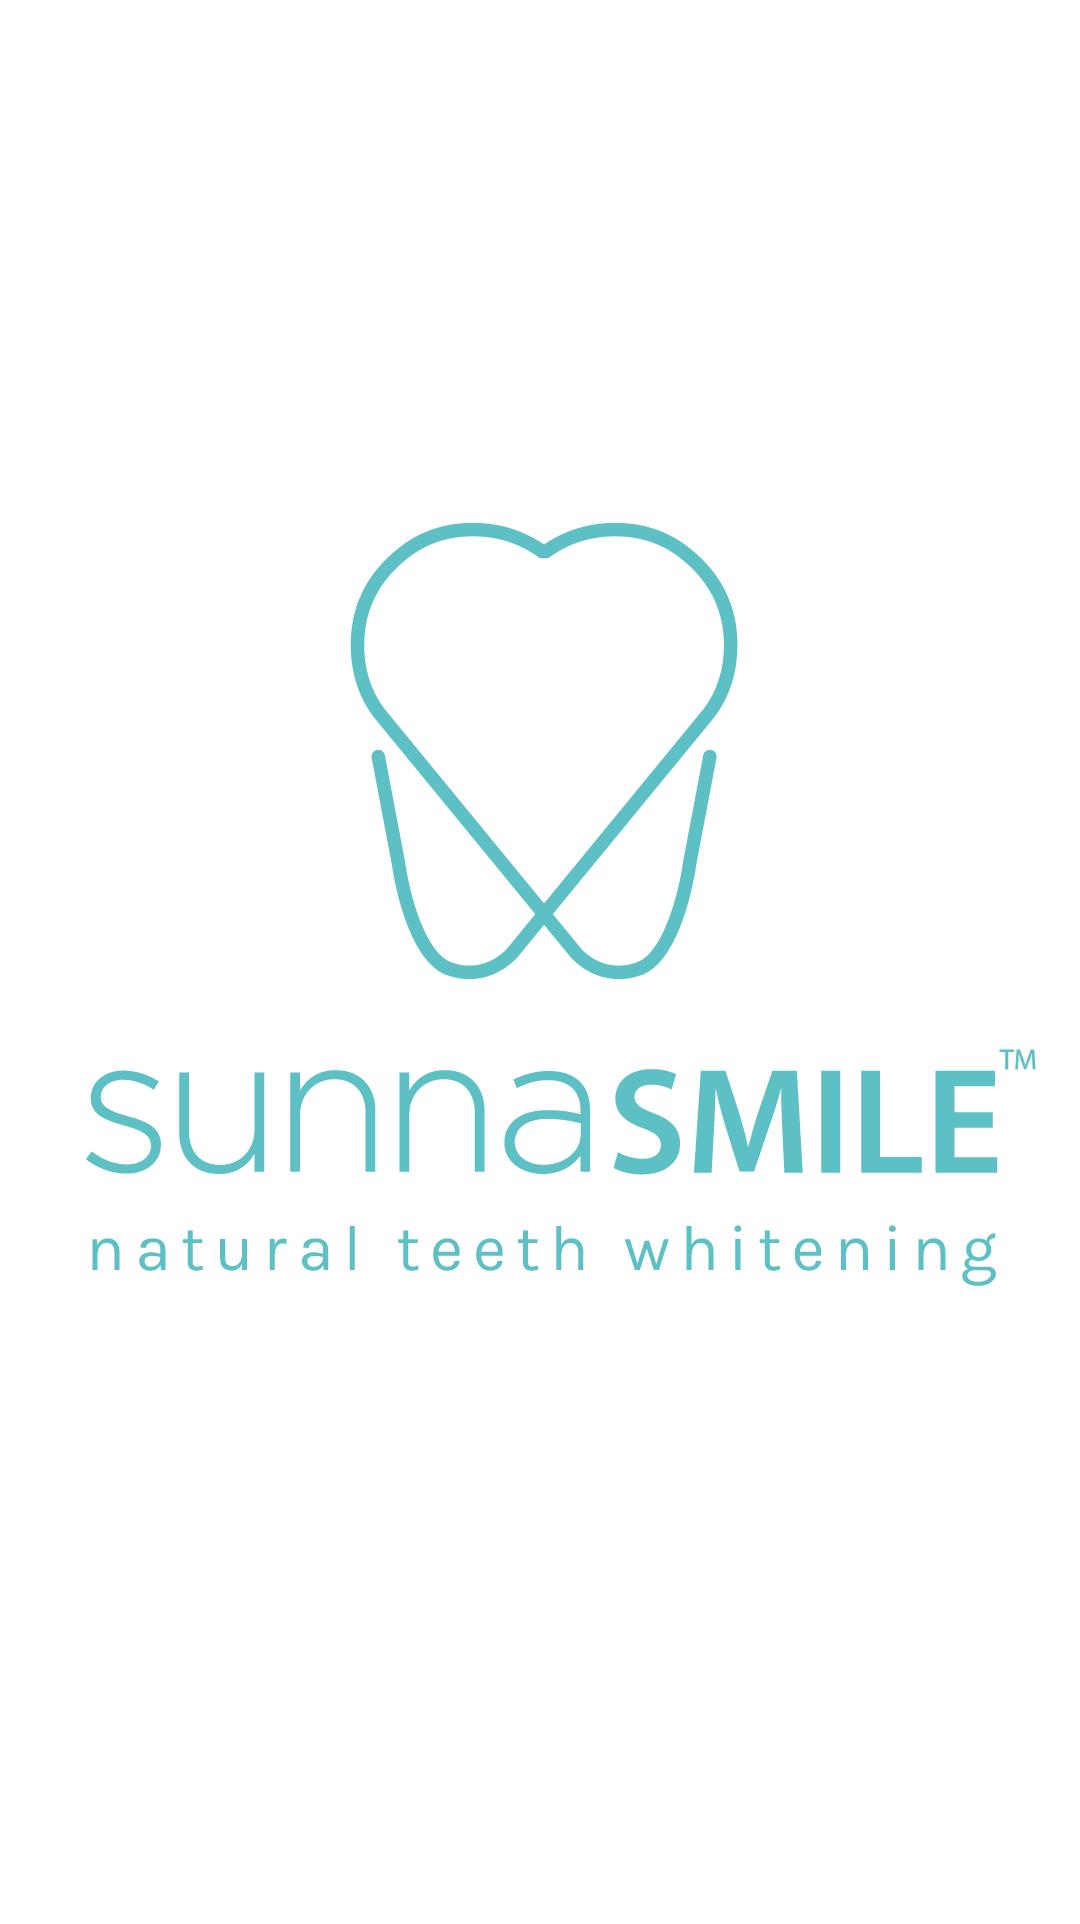 SunnaSmile_logo_white.png